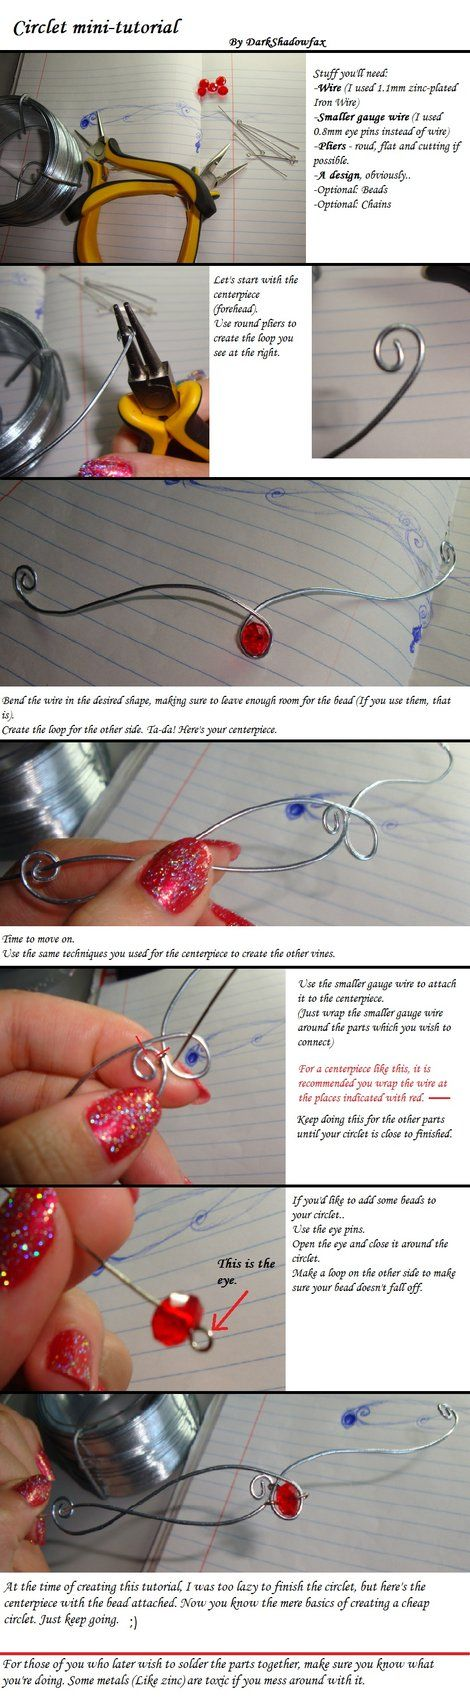 Circlet tutorial